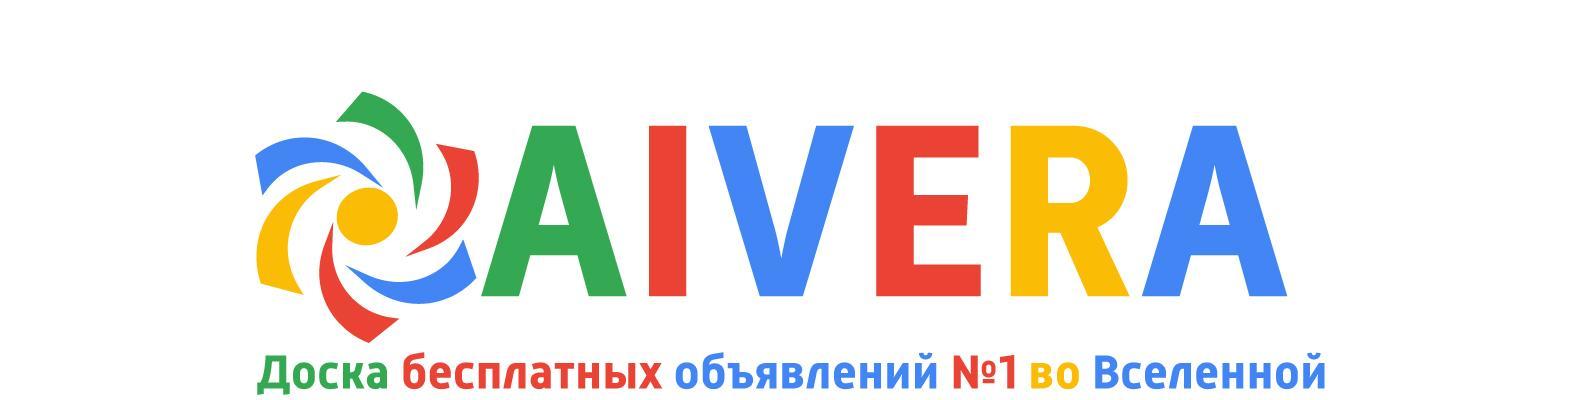 5c90bcfbe096b_aivera---.thumb.jpg.ee5728